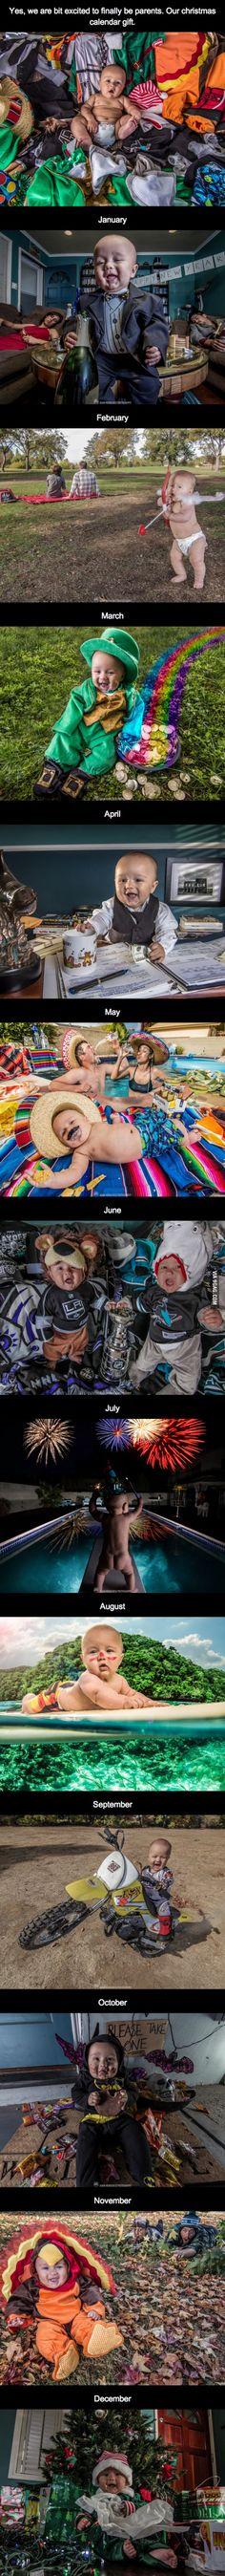 Awesome DIY Baby Calendar- hahaha